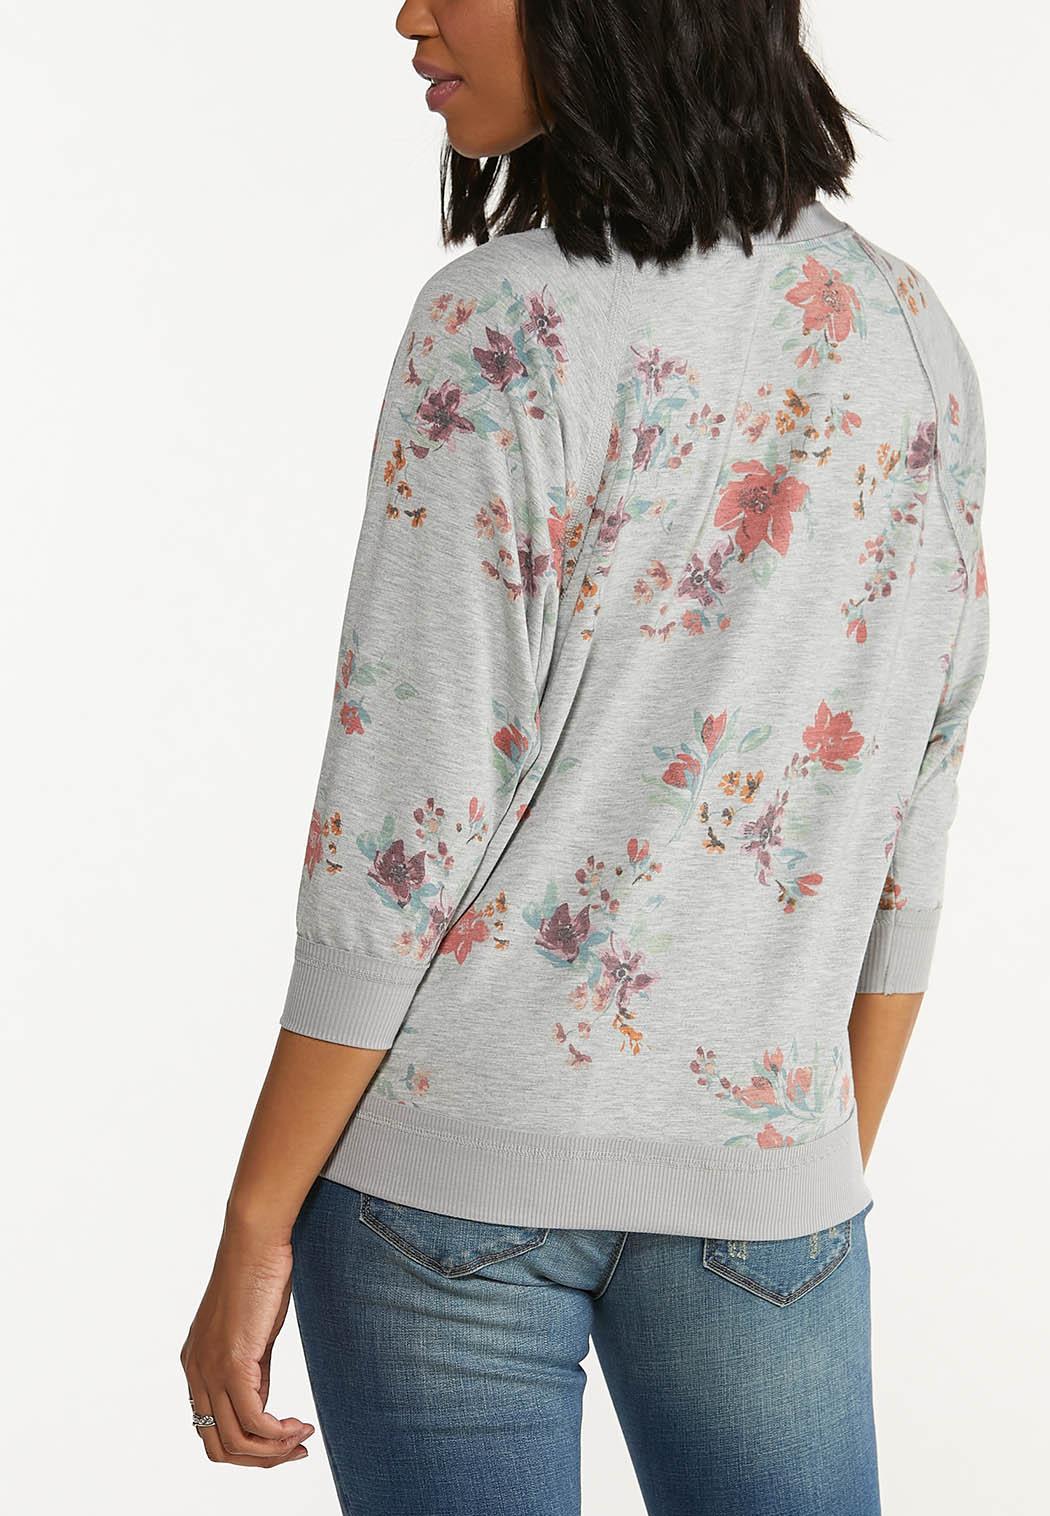 Gray Floral Sweatshirt (Item #44590173)